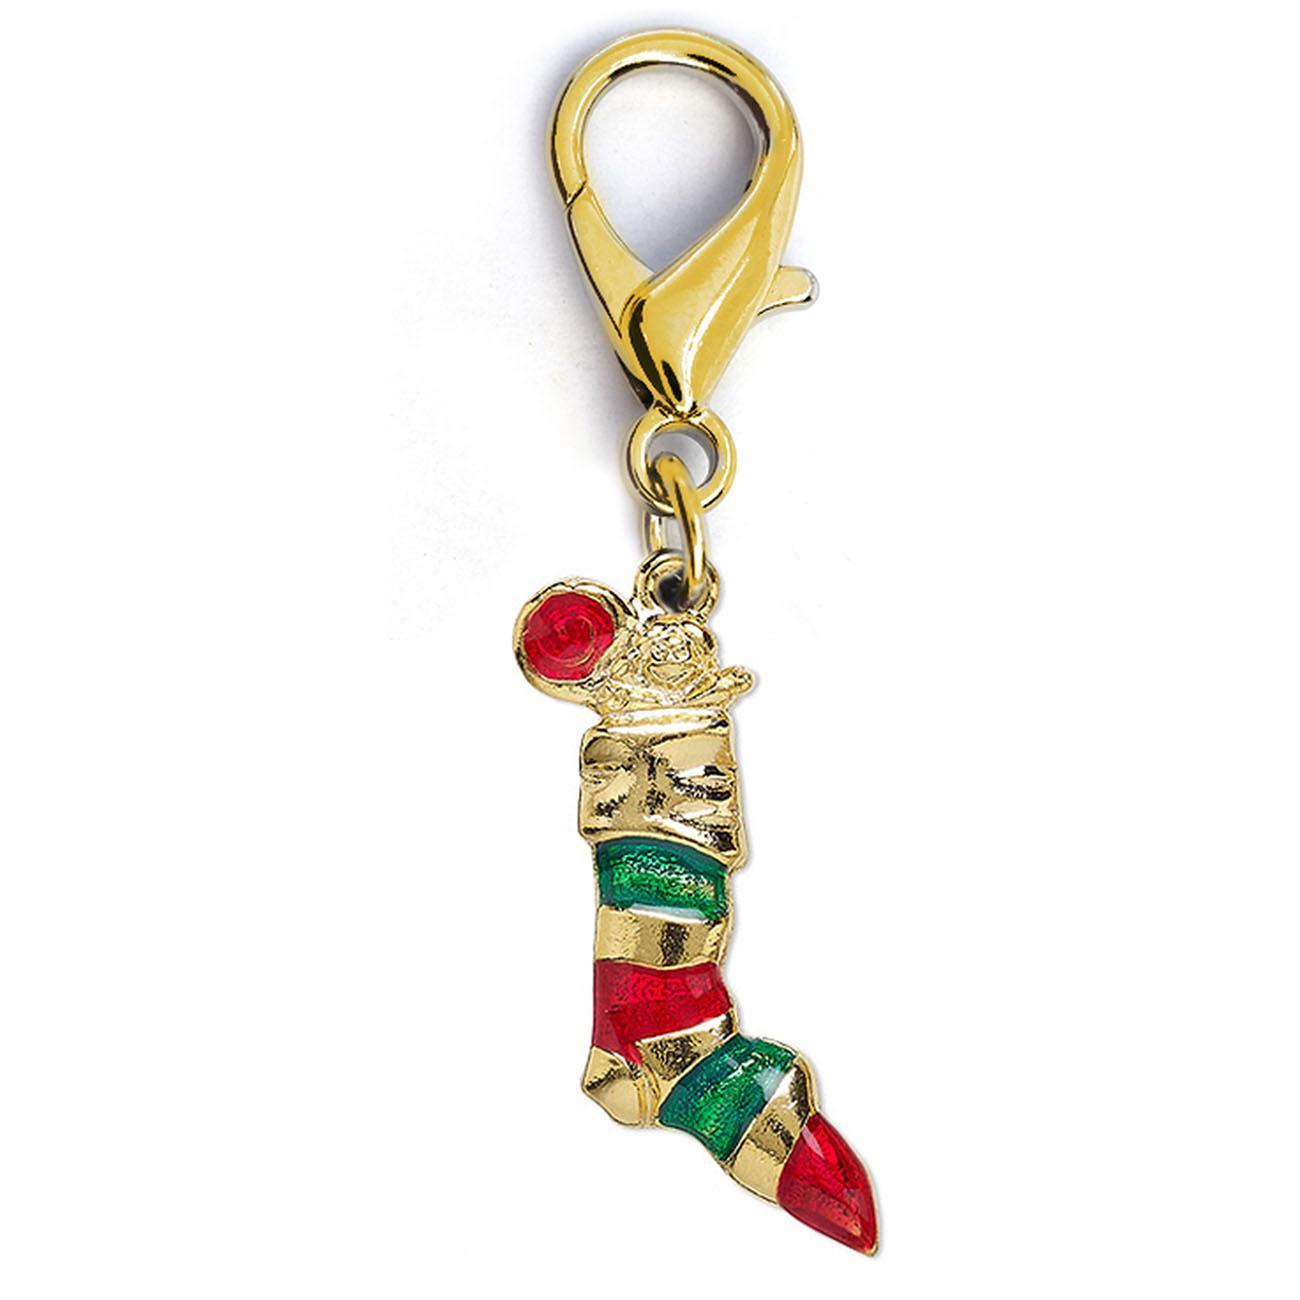 Christmas Stocking Dog Collar Charm by Diva Dog - Gold